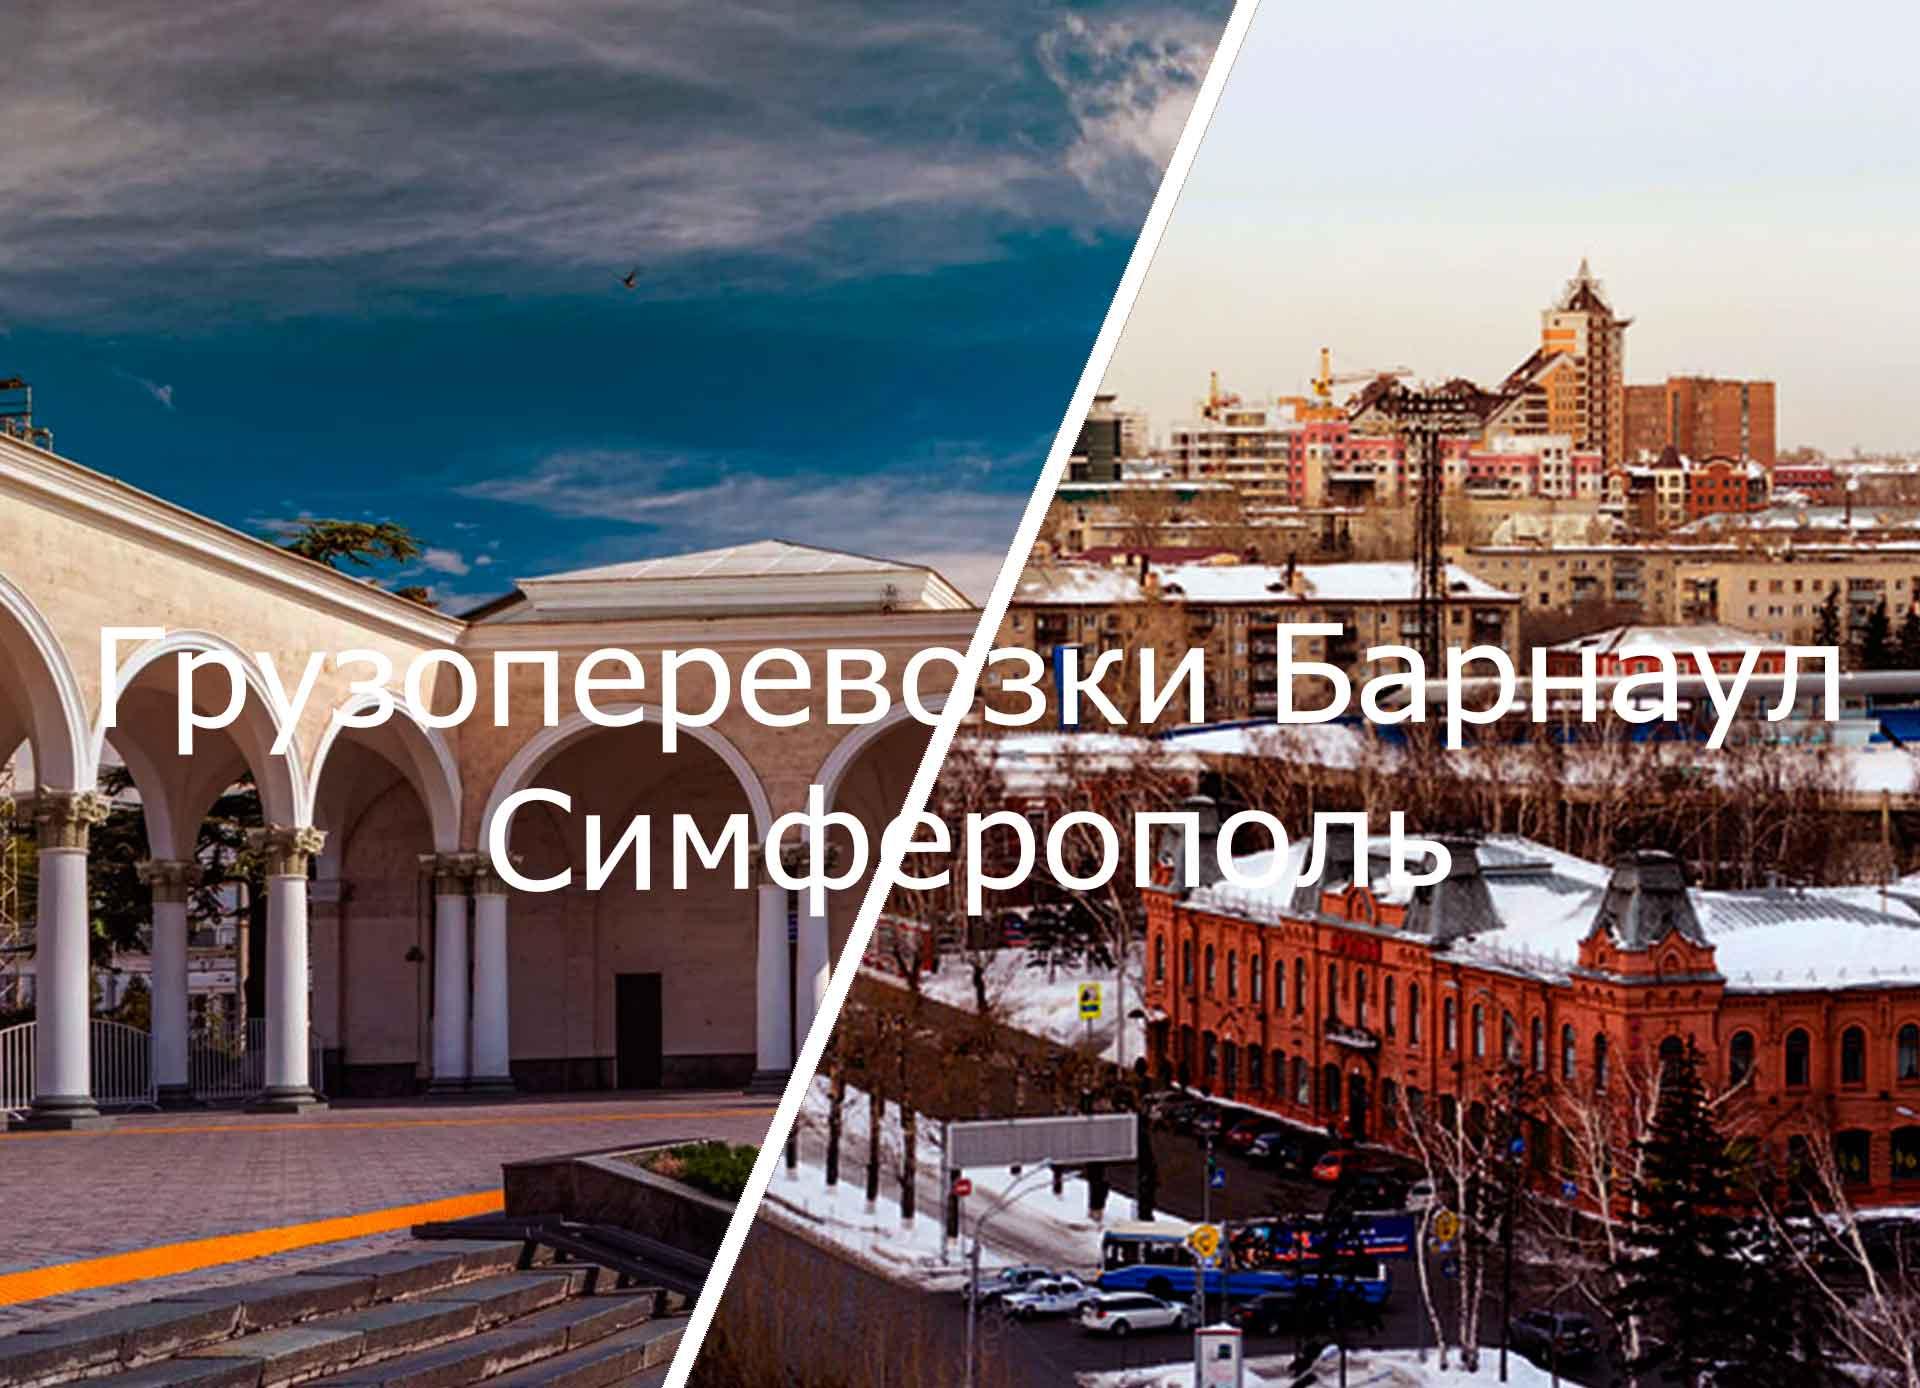 грузоперевозки барнаул симферополь